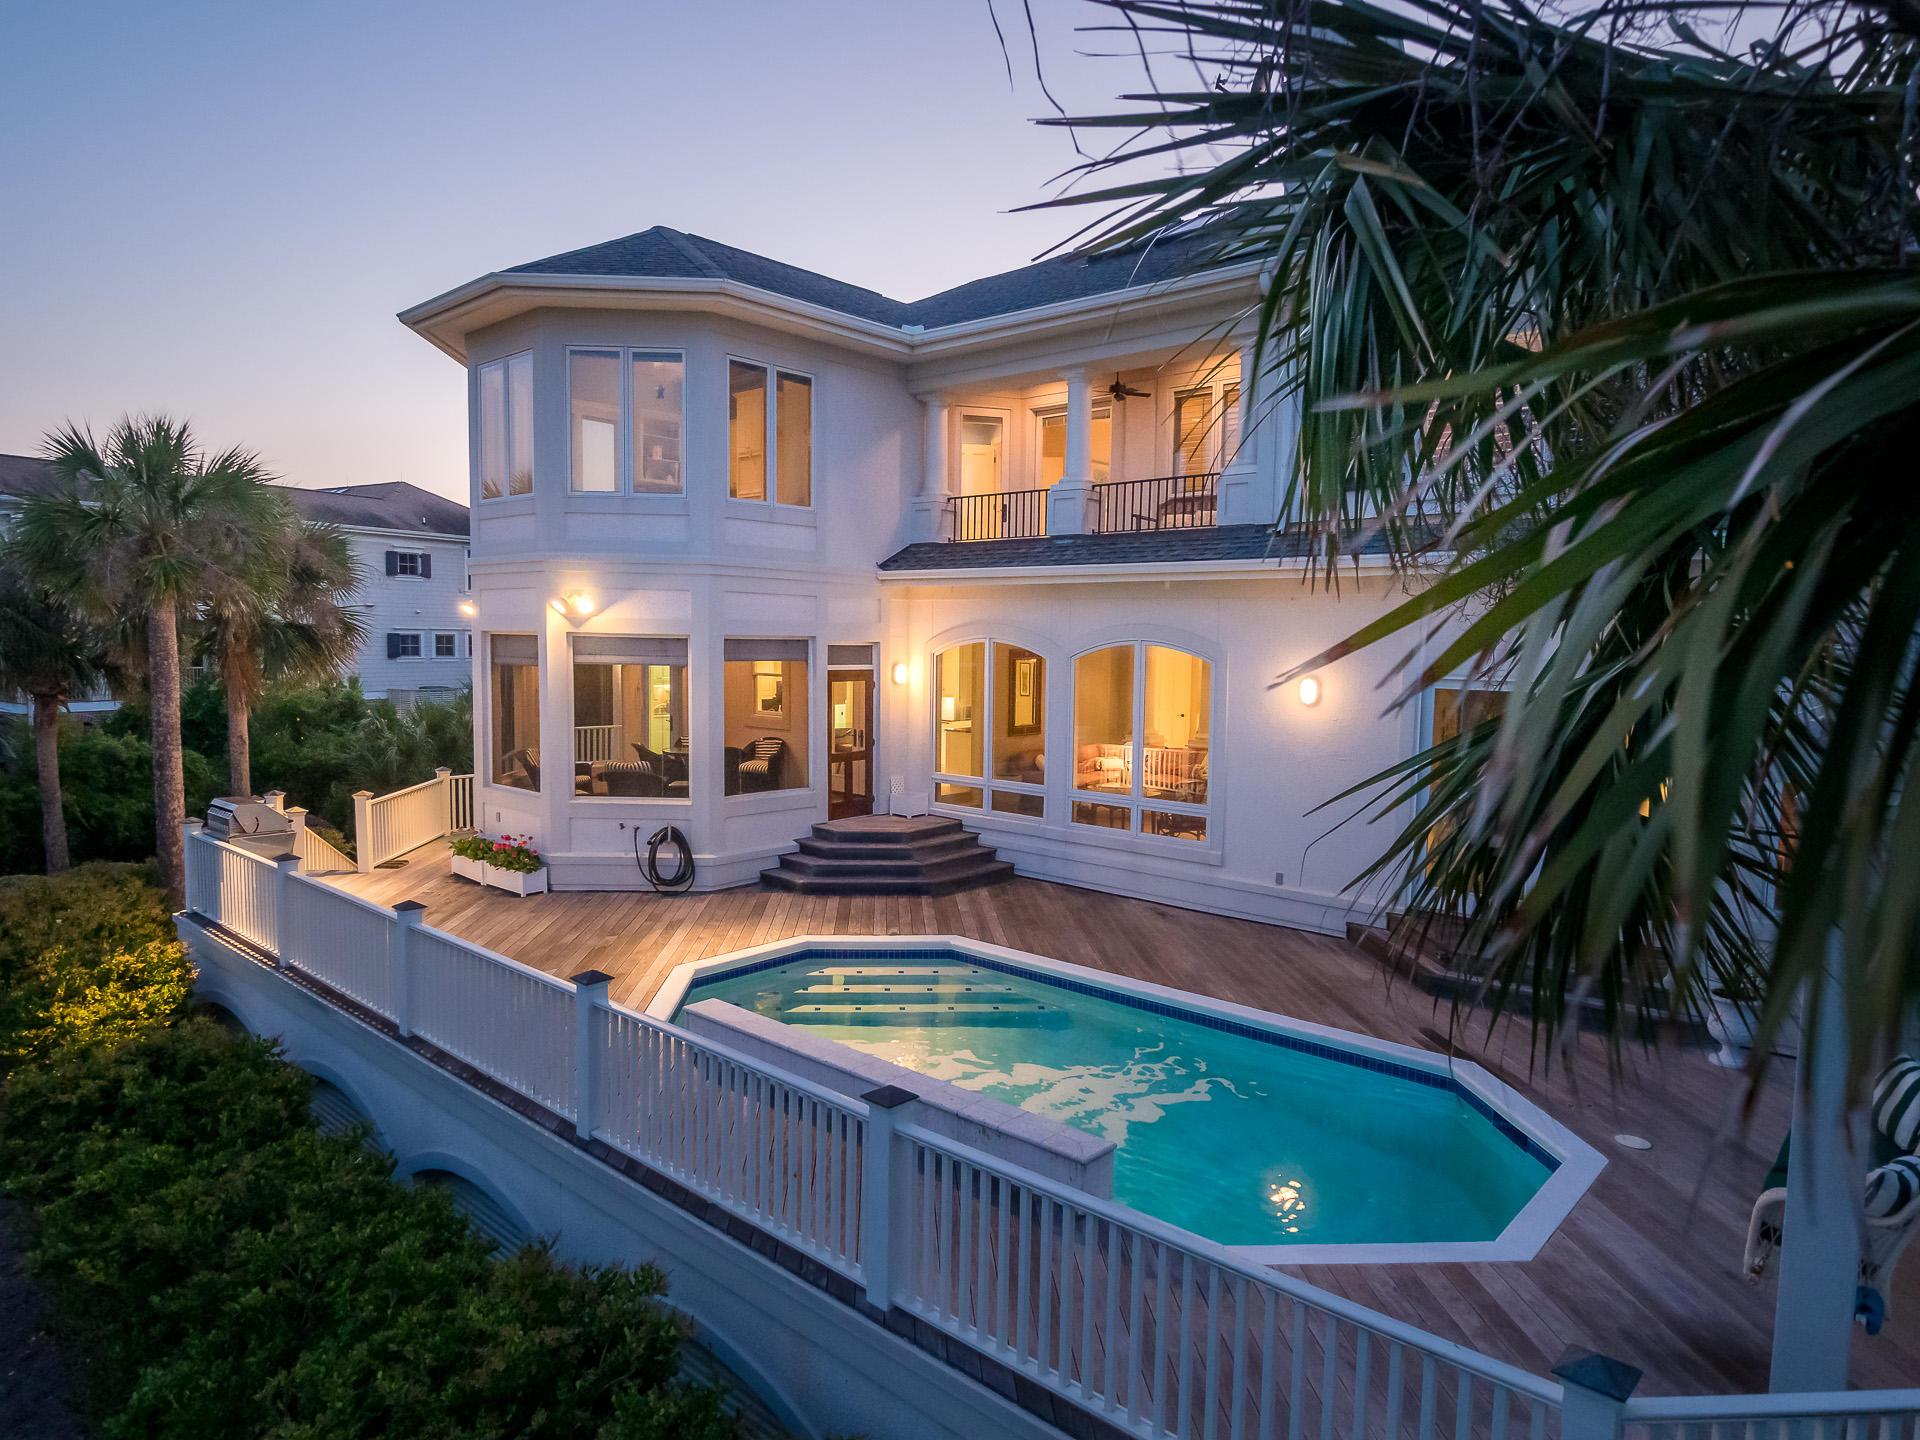 Seabrook Island Homes For Sale - 2216 Rolling Dune, Seabrook Island, SC - 27